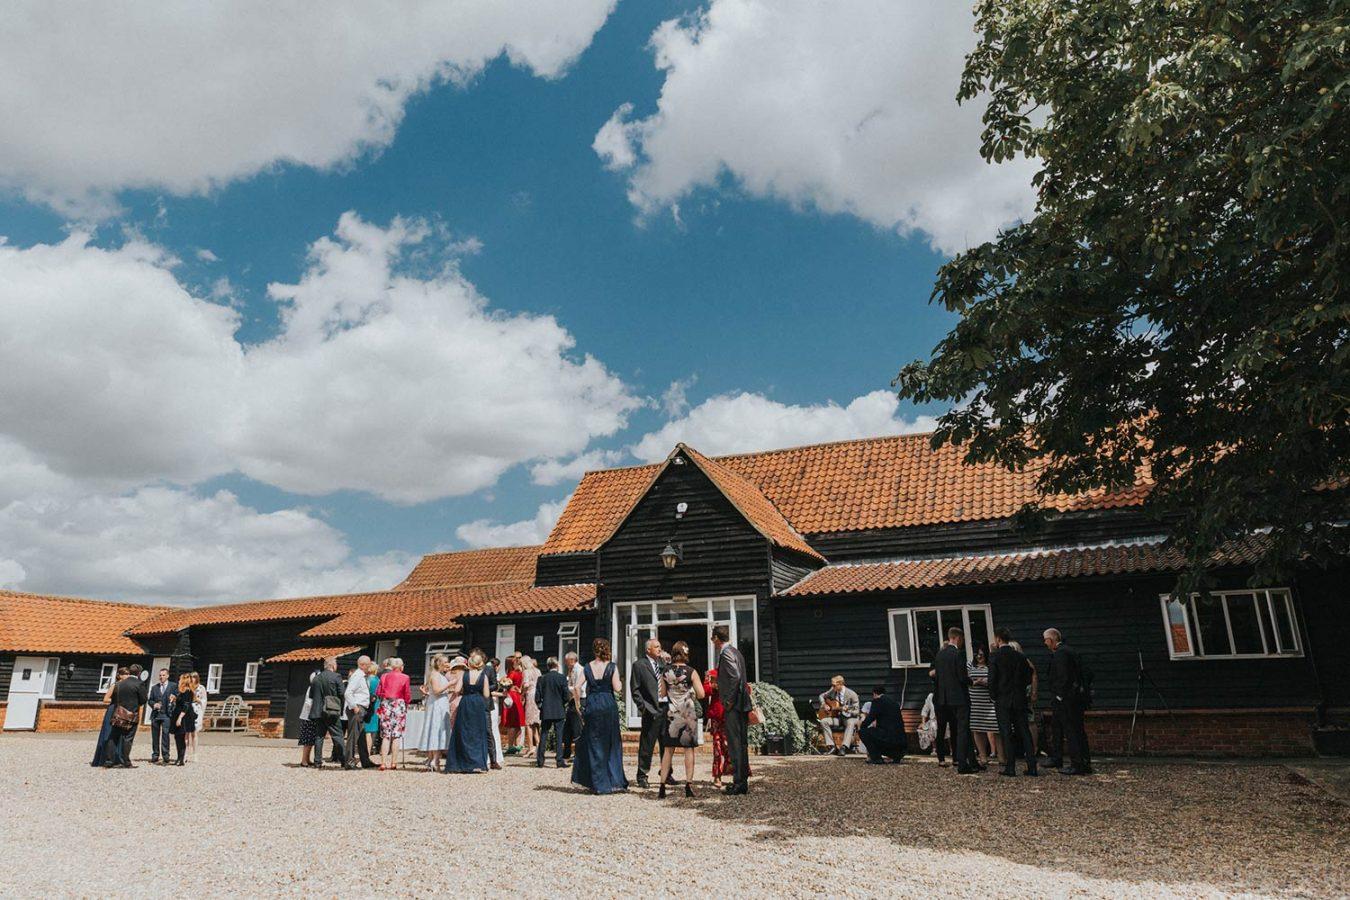 vaulty-manor-wedding-photography-098